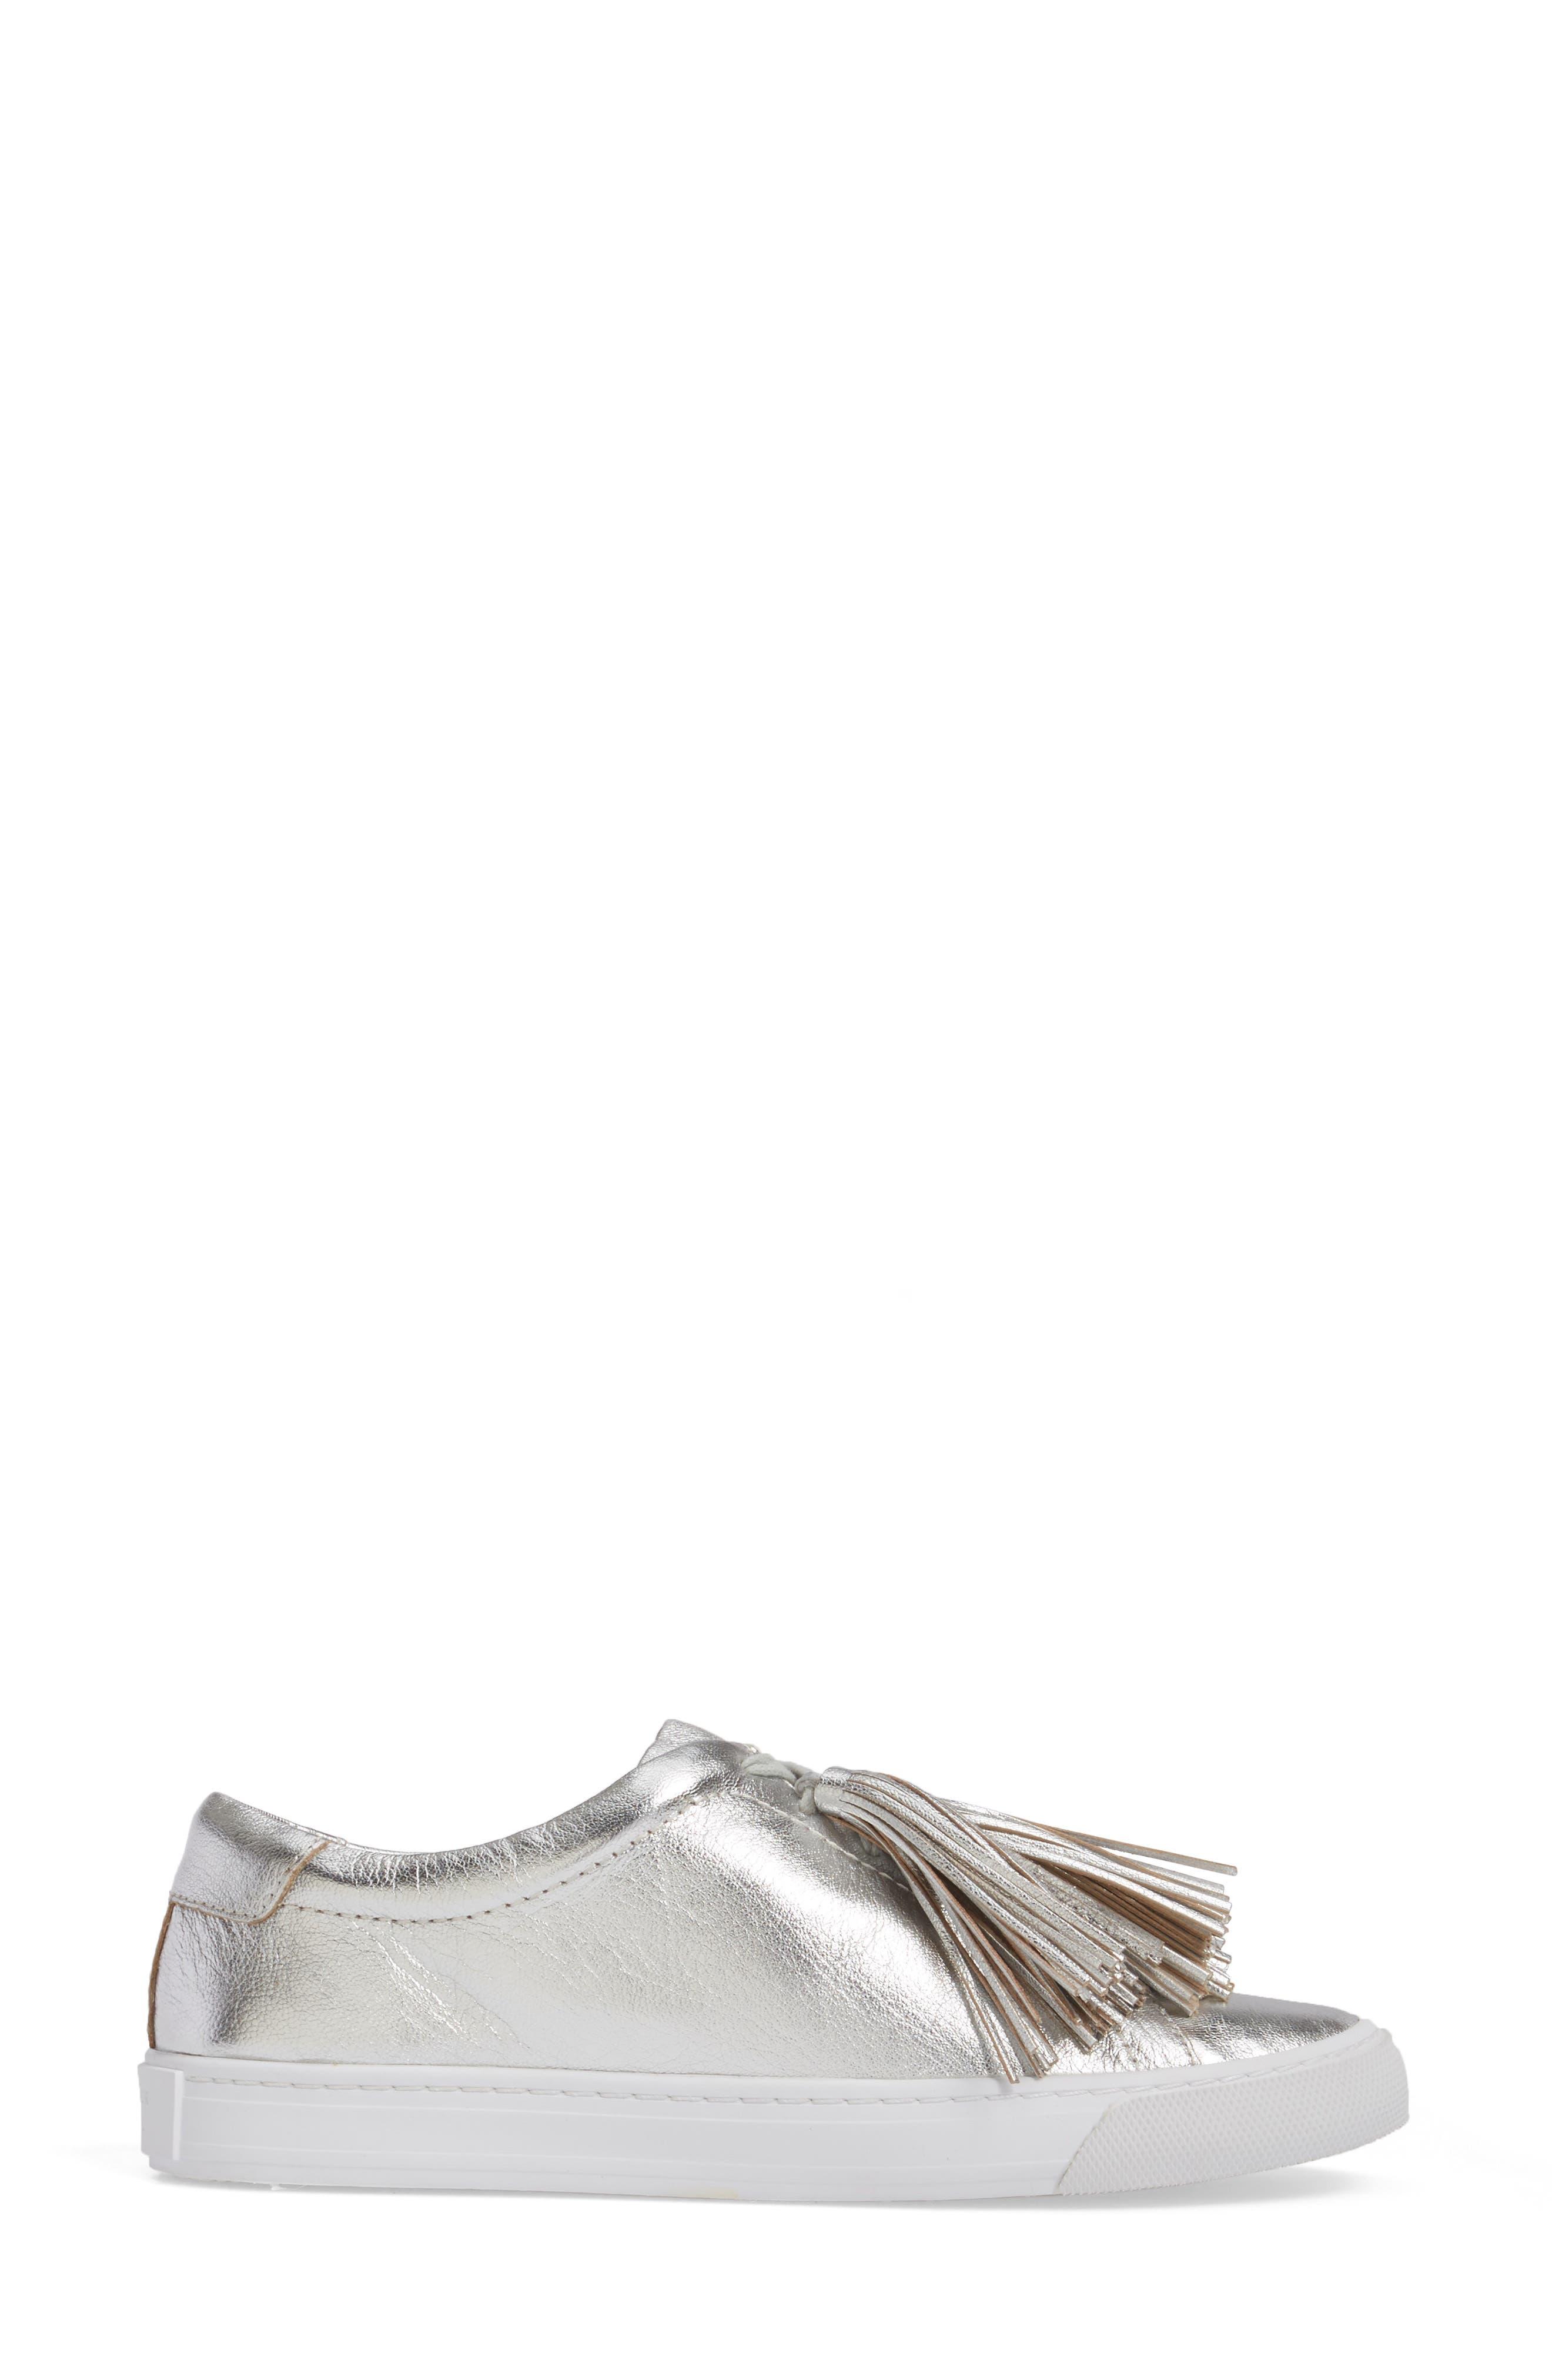 Logan Sneaker,                             Alternate thumbnail 3, color,                             040